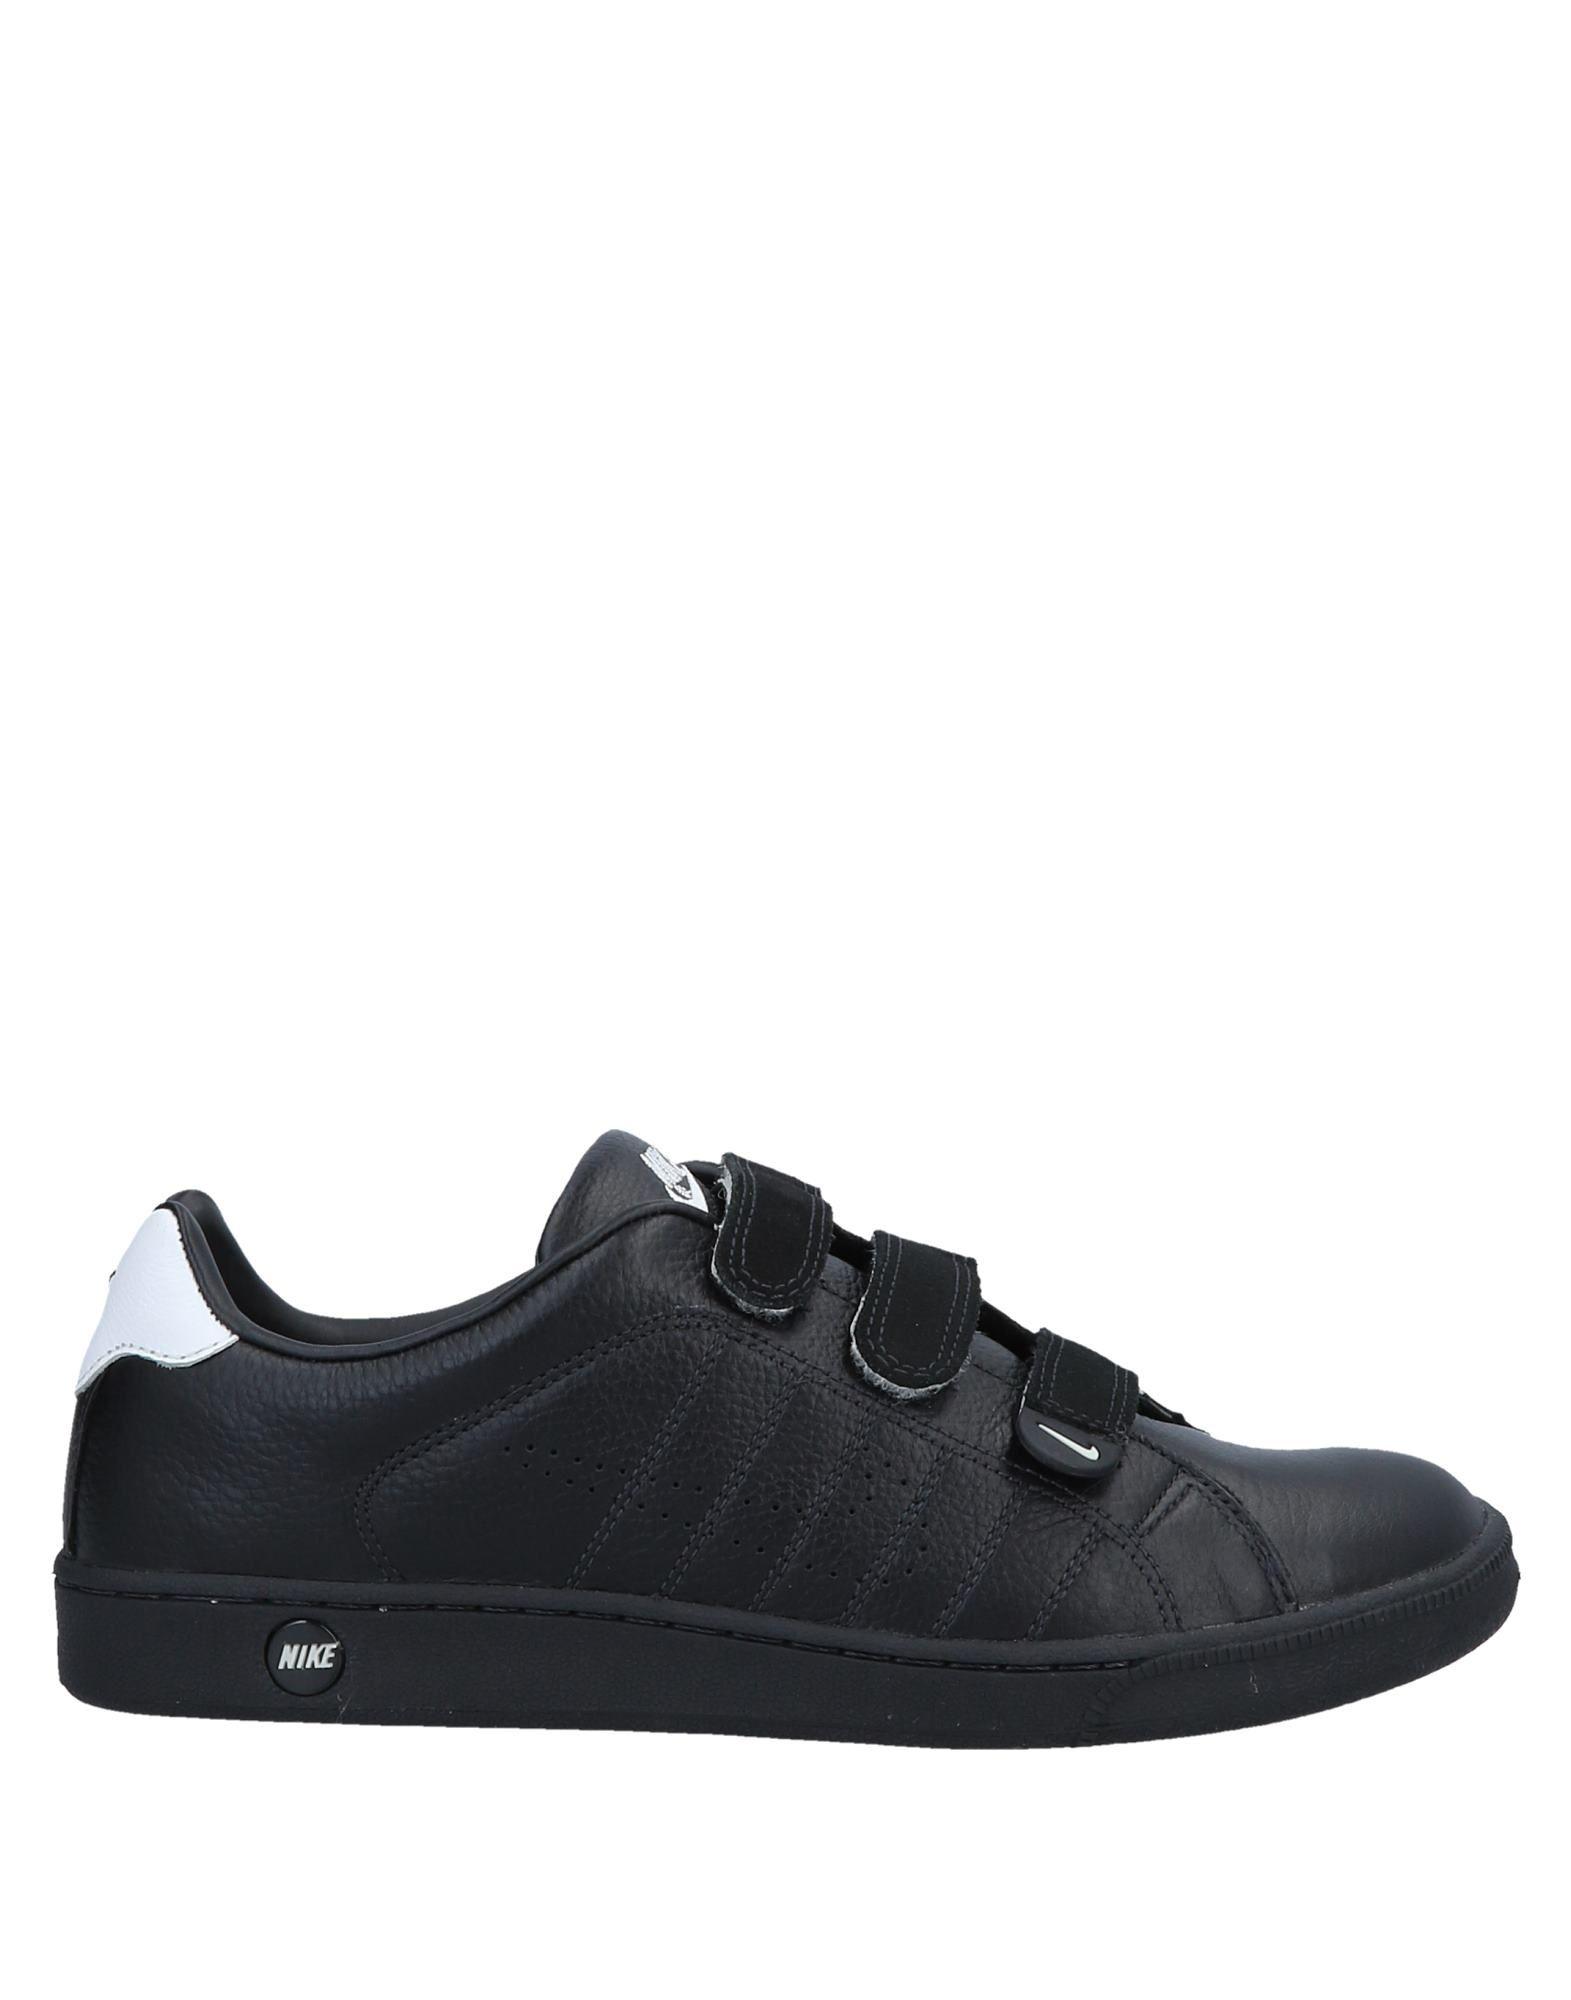 Nike Sneakers Herren  11573055RP Gute Qualität beliebte Schuhe